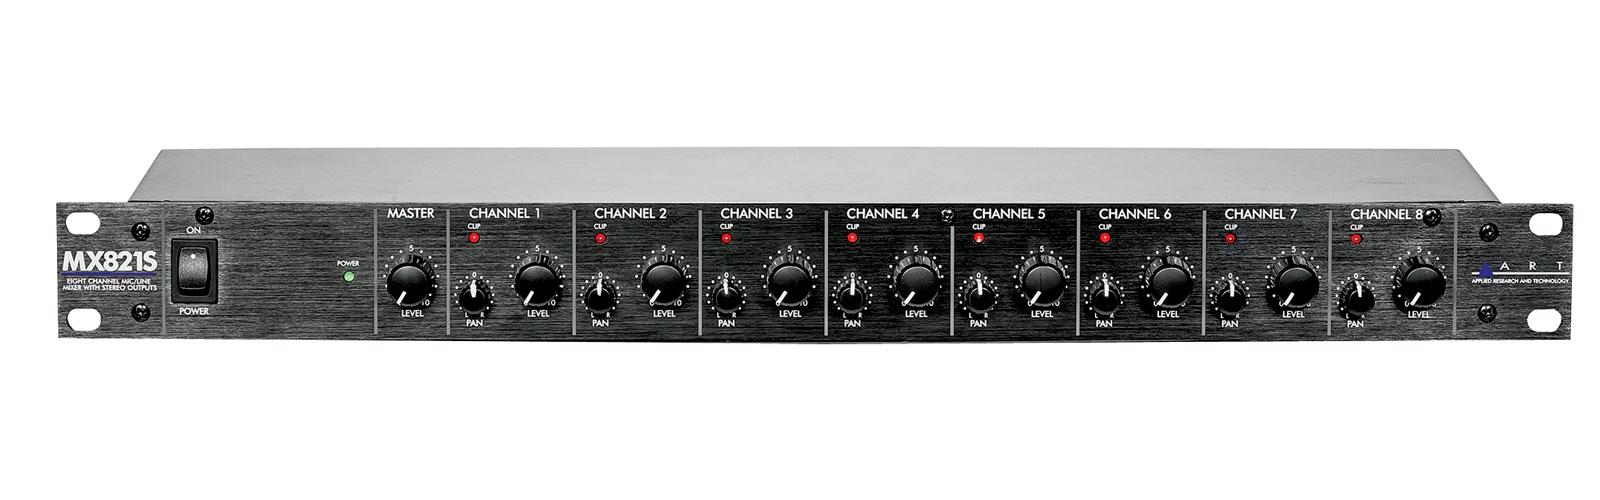 Art Pro Audio Mx821s